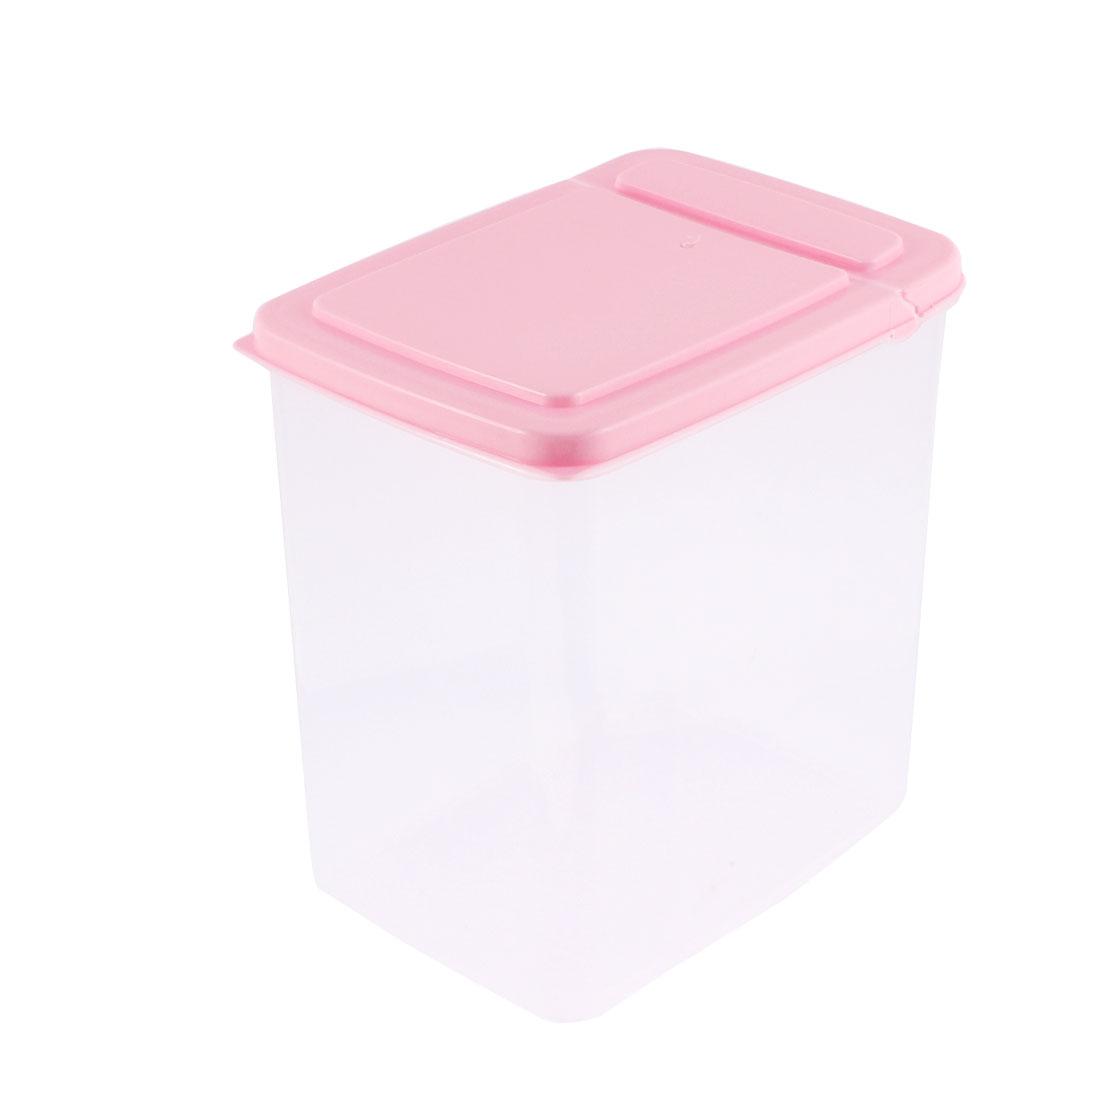 Plastic Food Storage Box Container Case 15cm x 11cm x 16cm 2L Pink